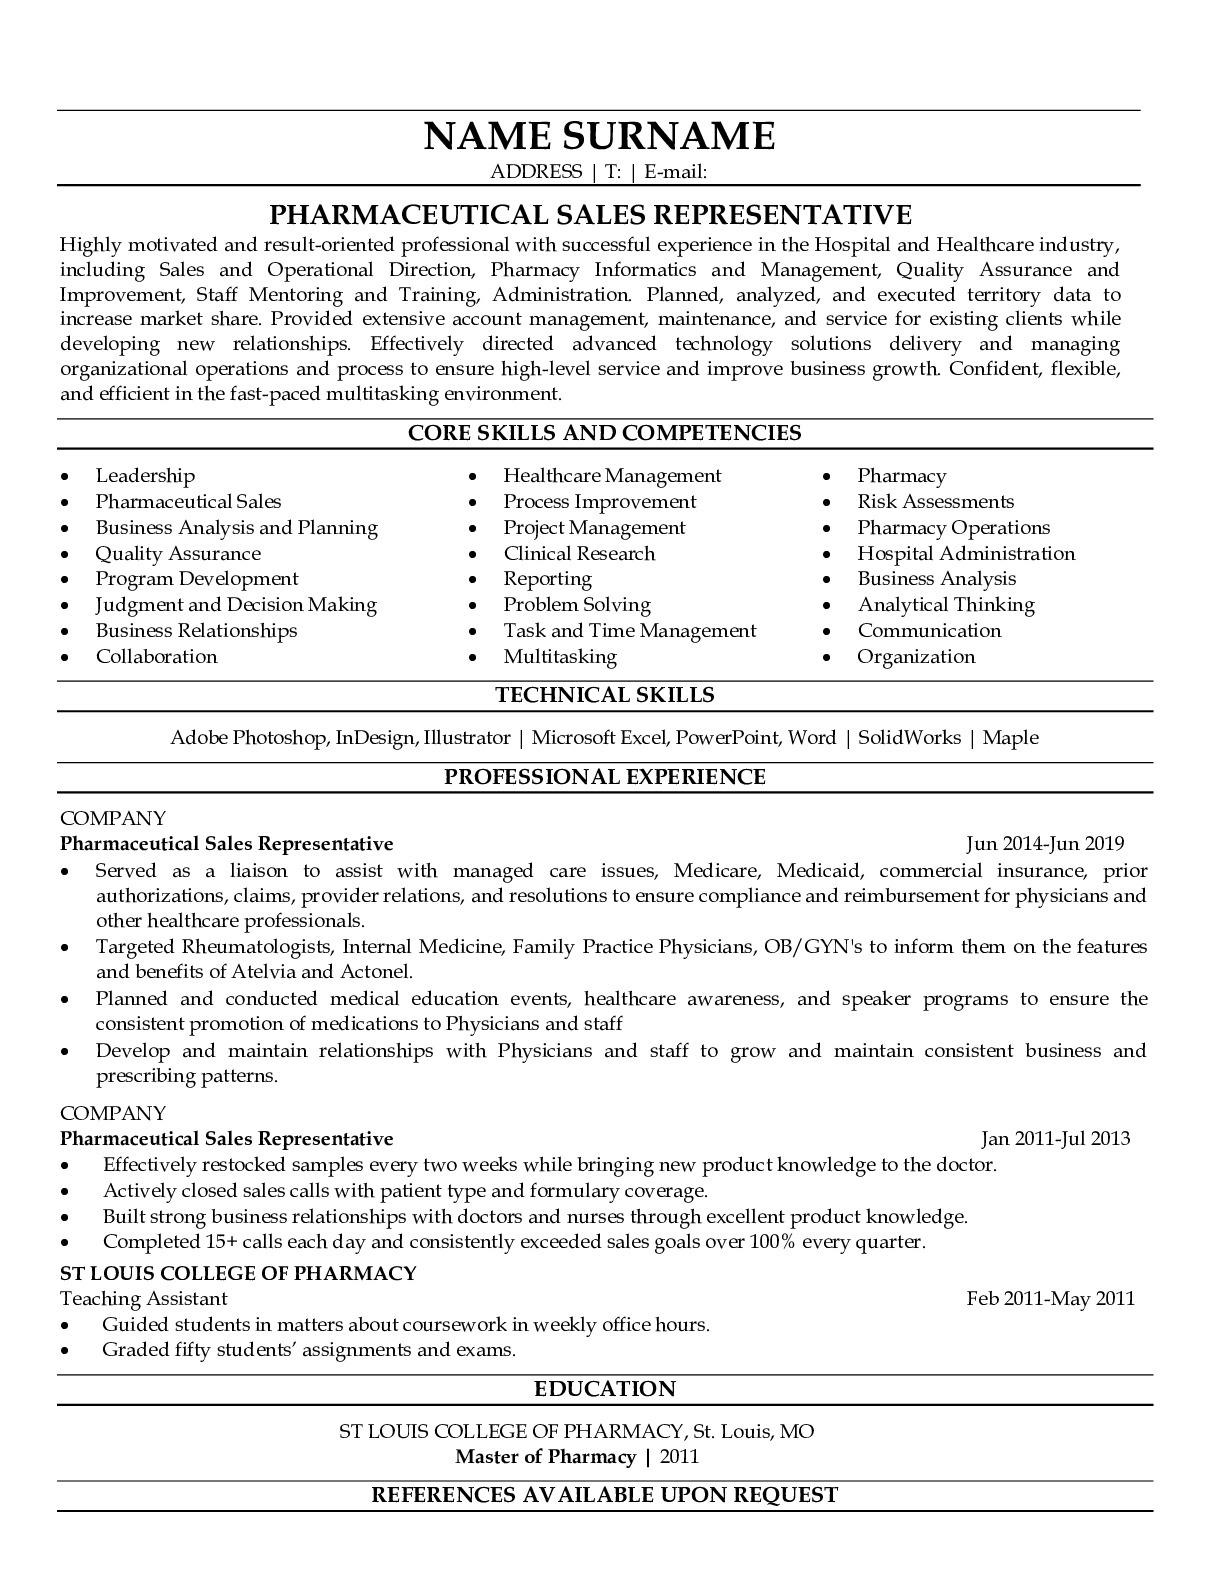 Resume Example for Pharmaceutical Sales Representative